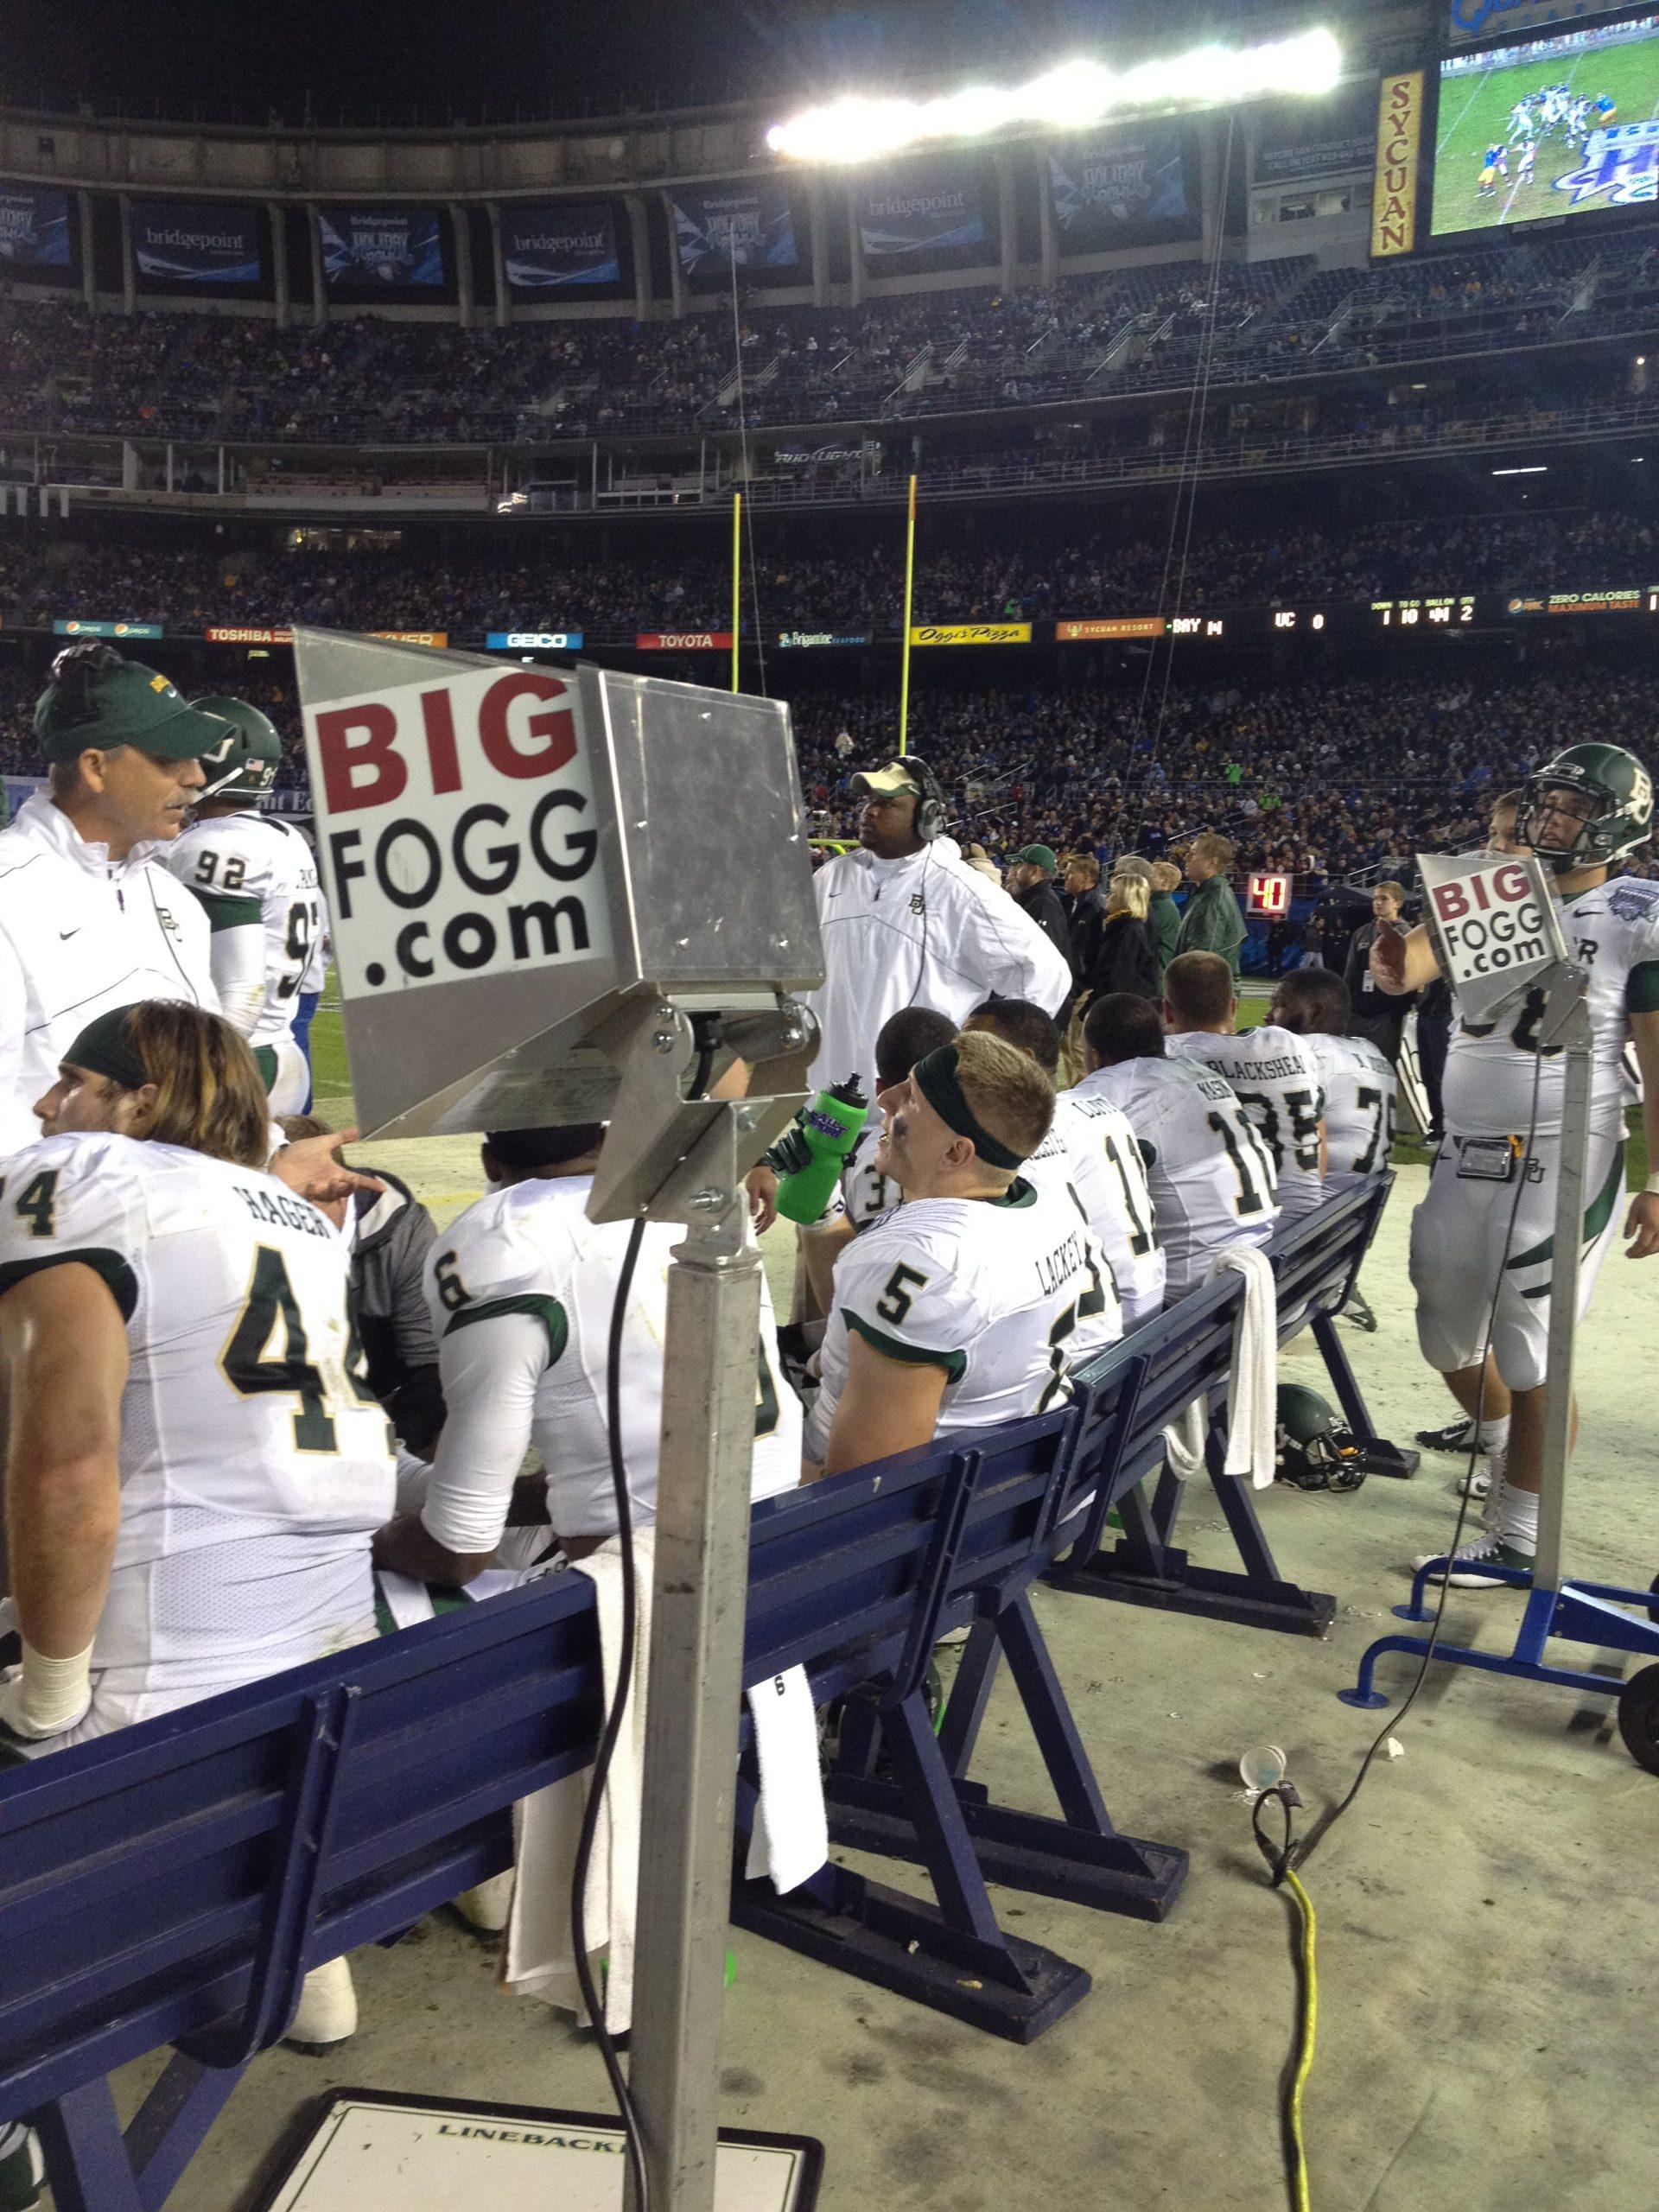 Big Fogg™